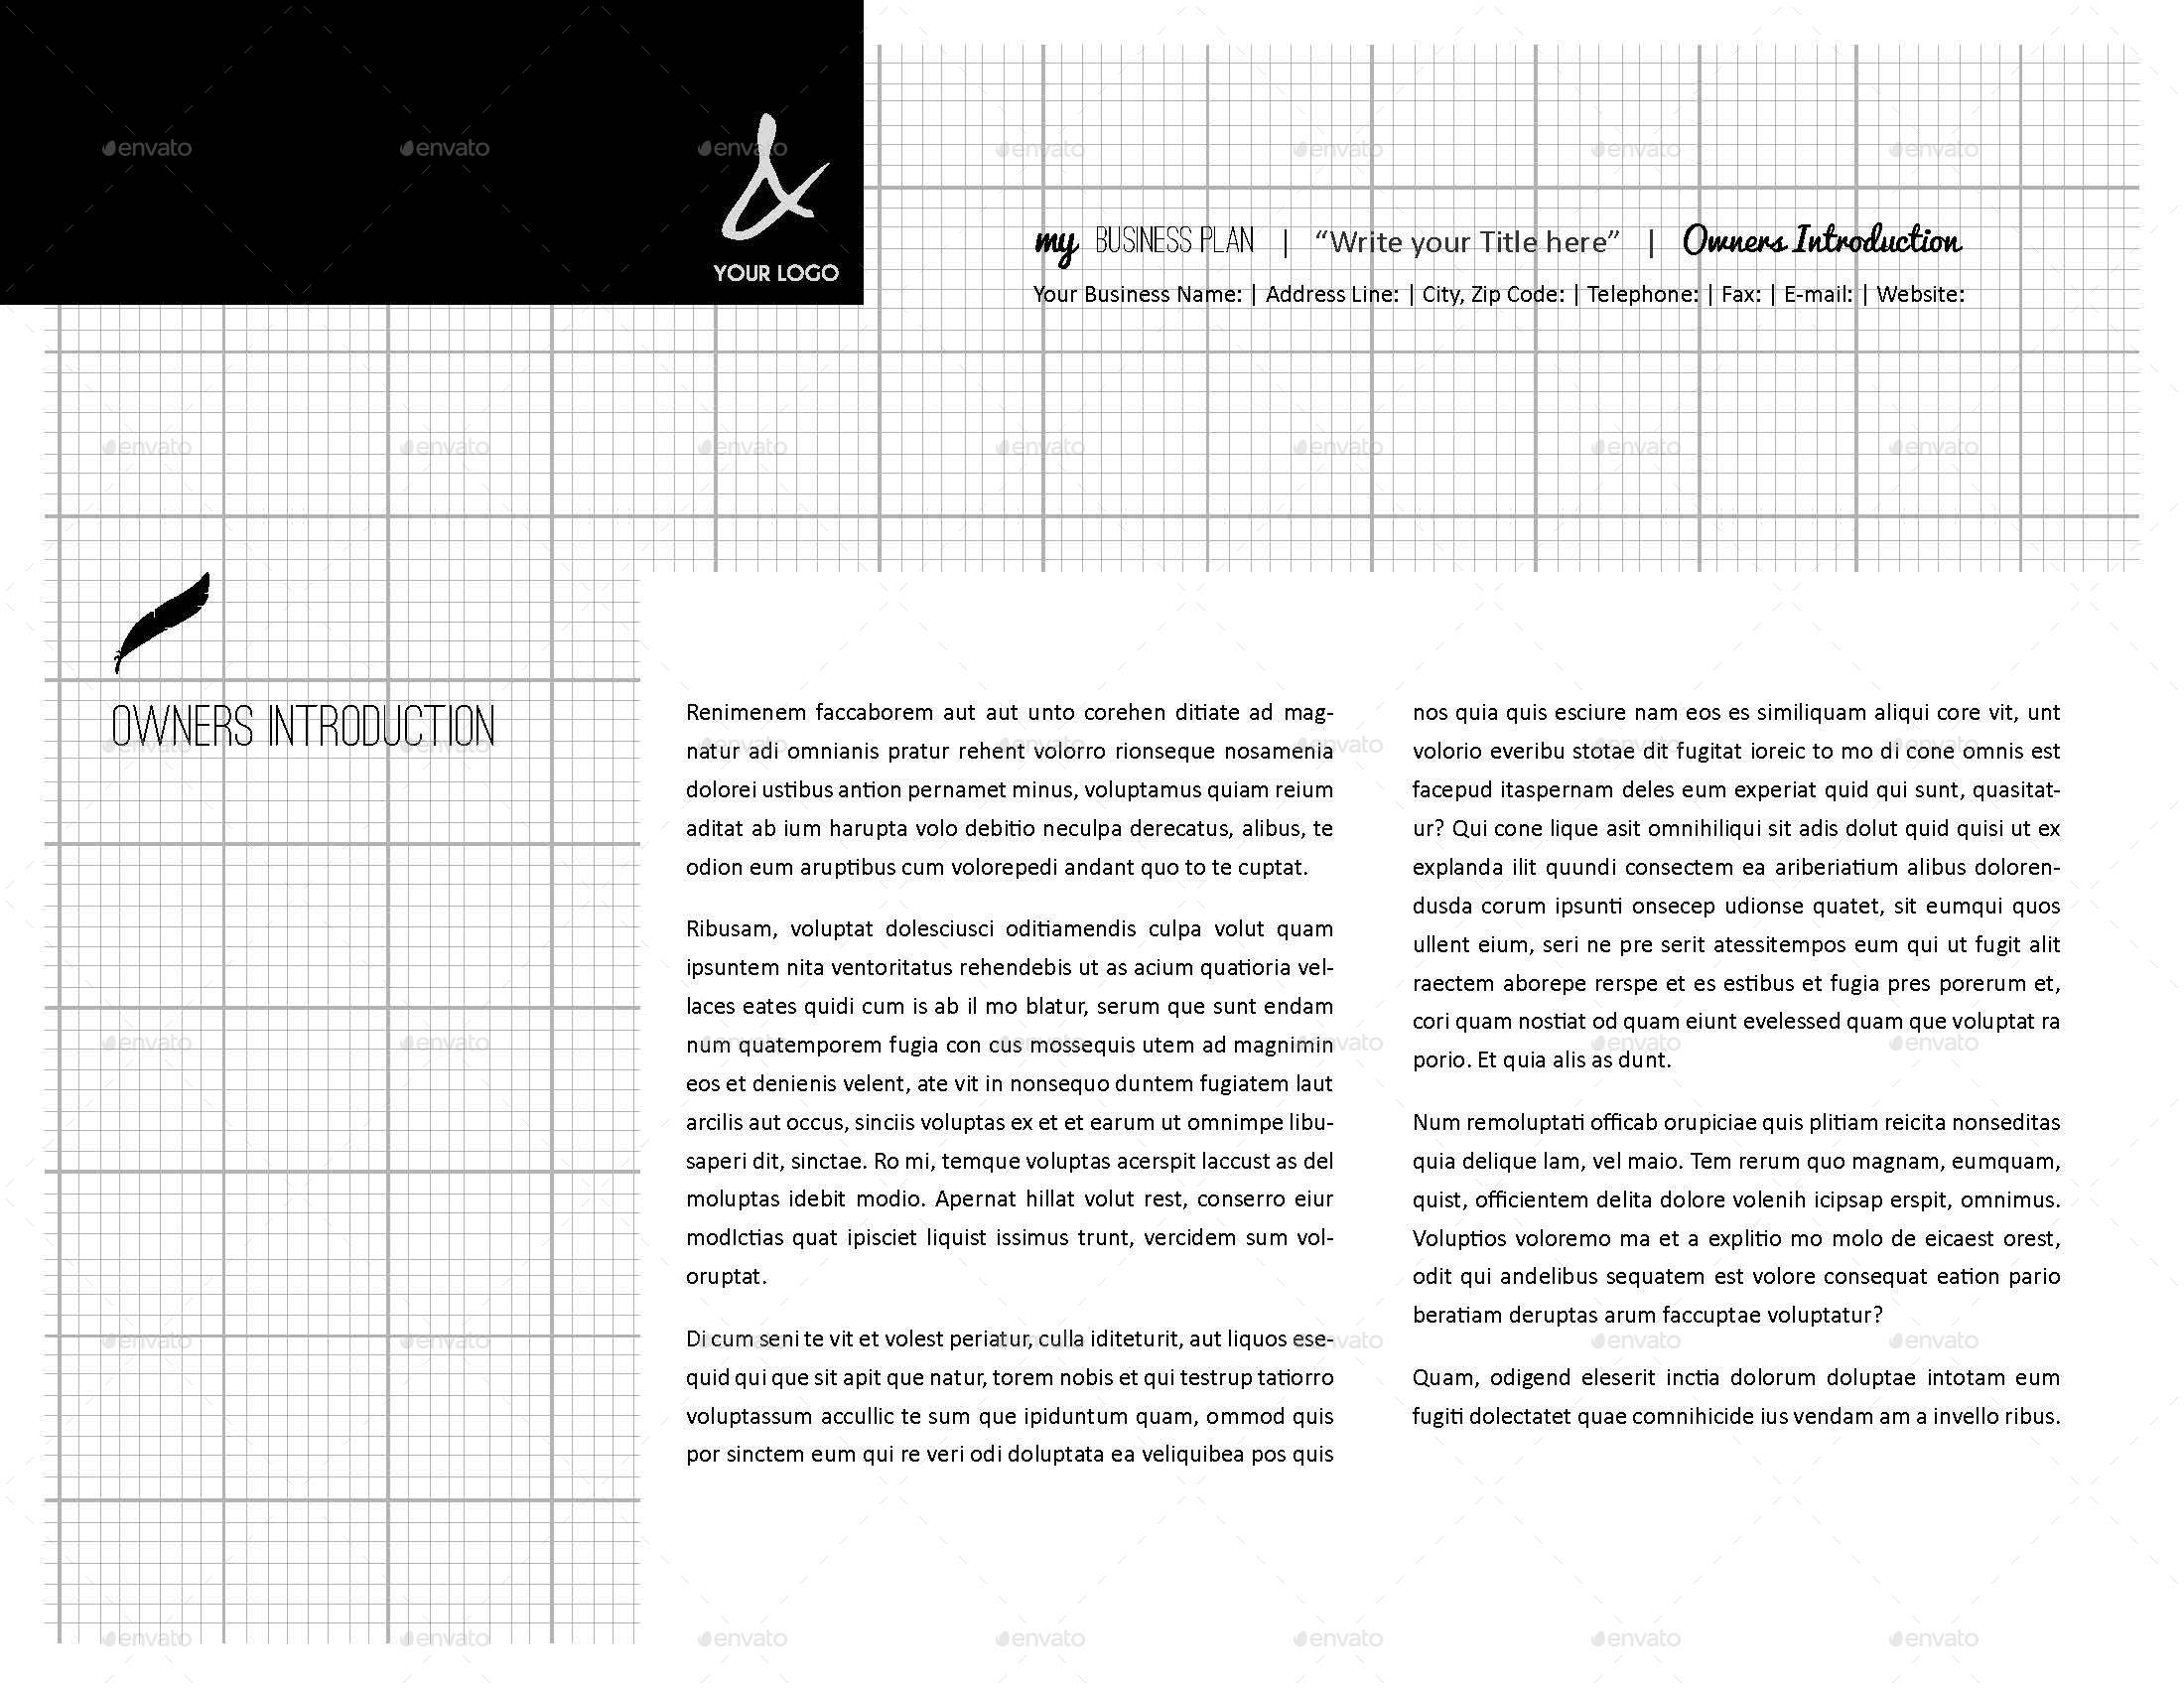 My Business Plan Digital Template By Keboto GraphicRiver - Digital business plan template